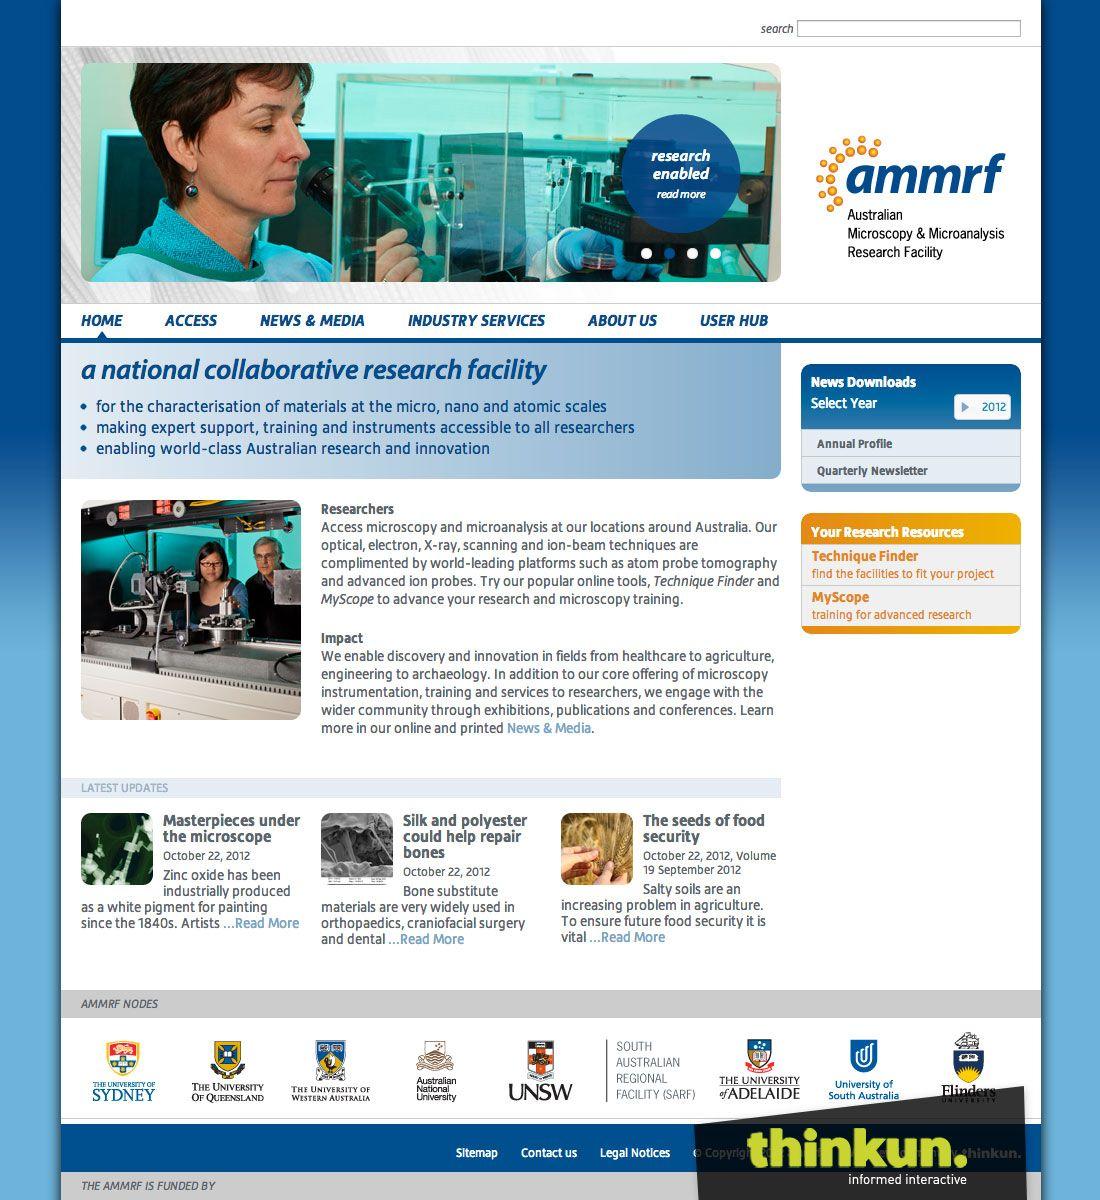 http://www.ammrf.org.au/  AMMRF website